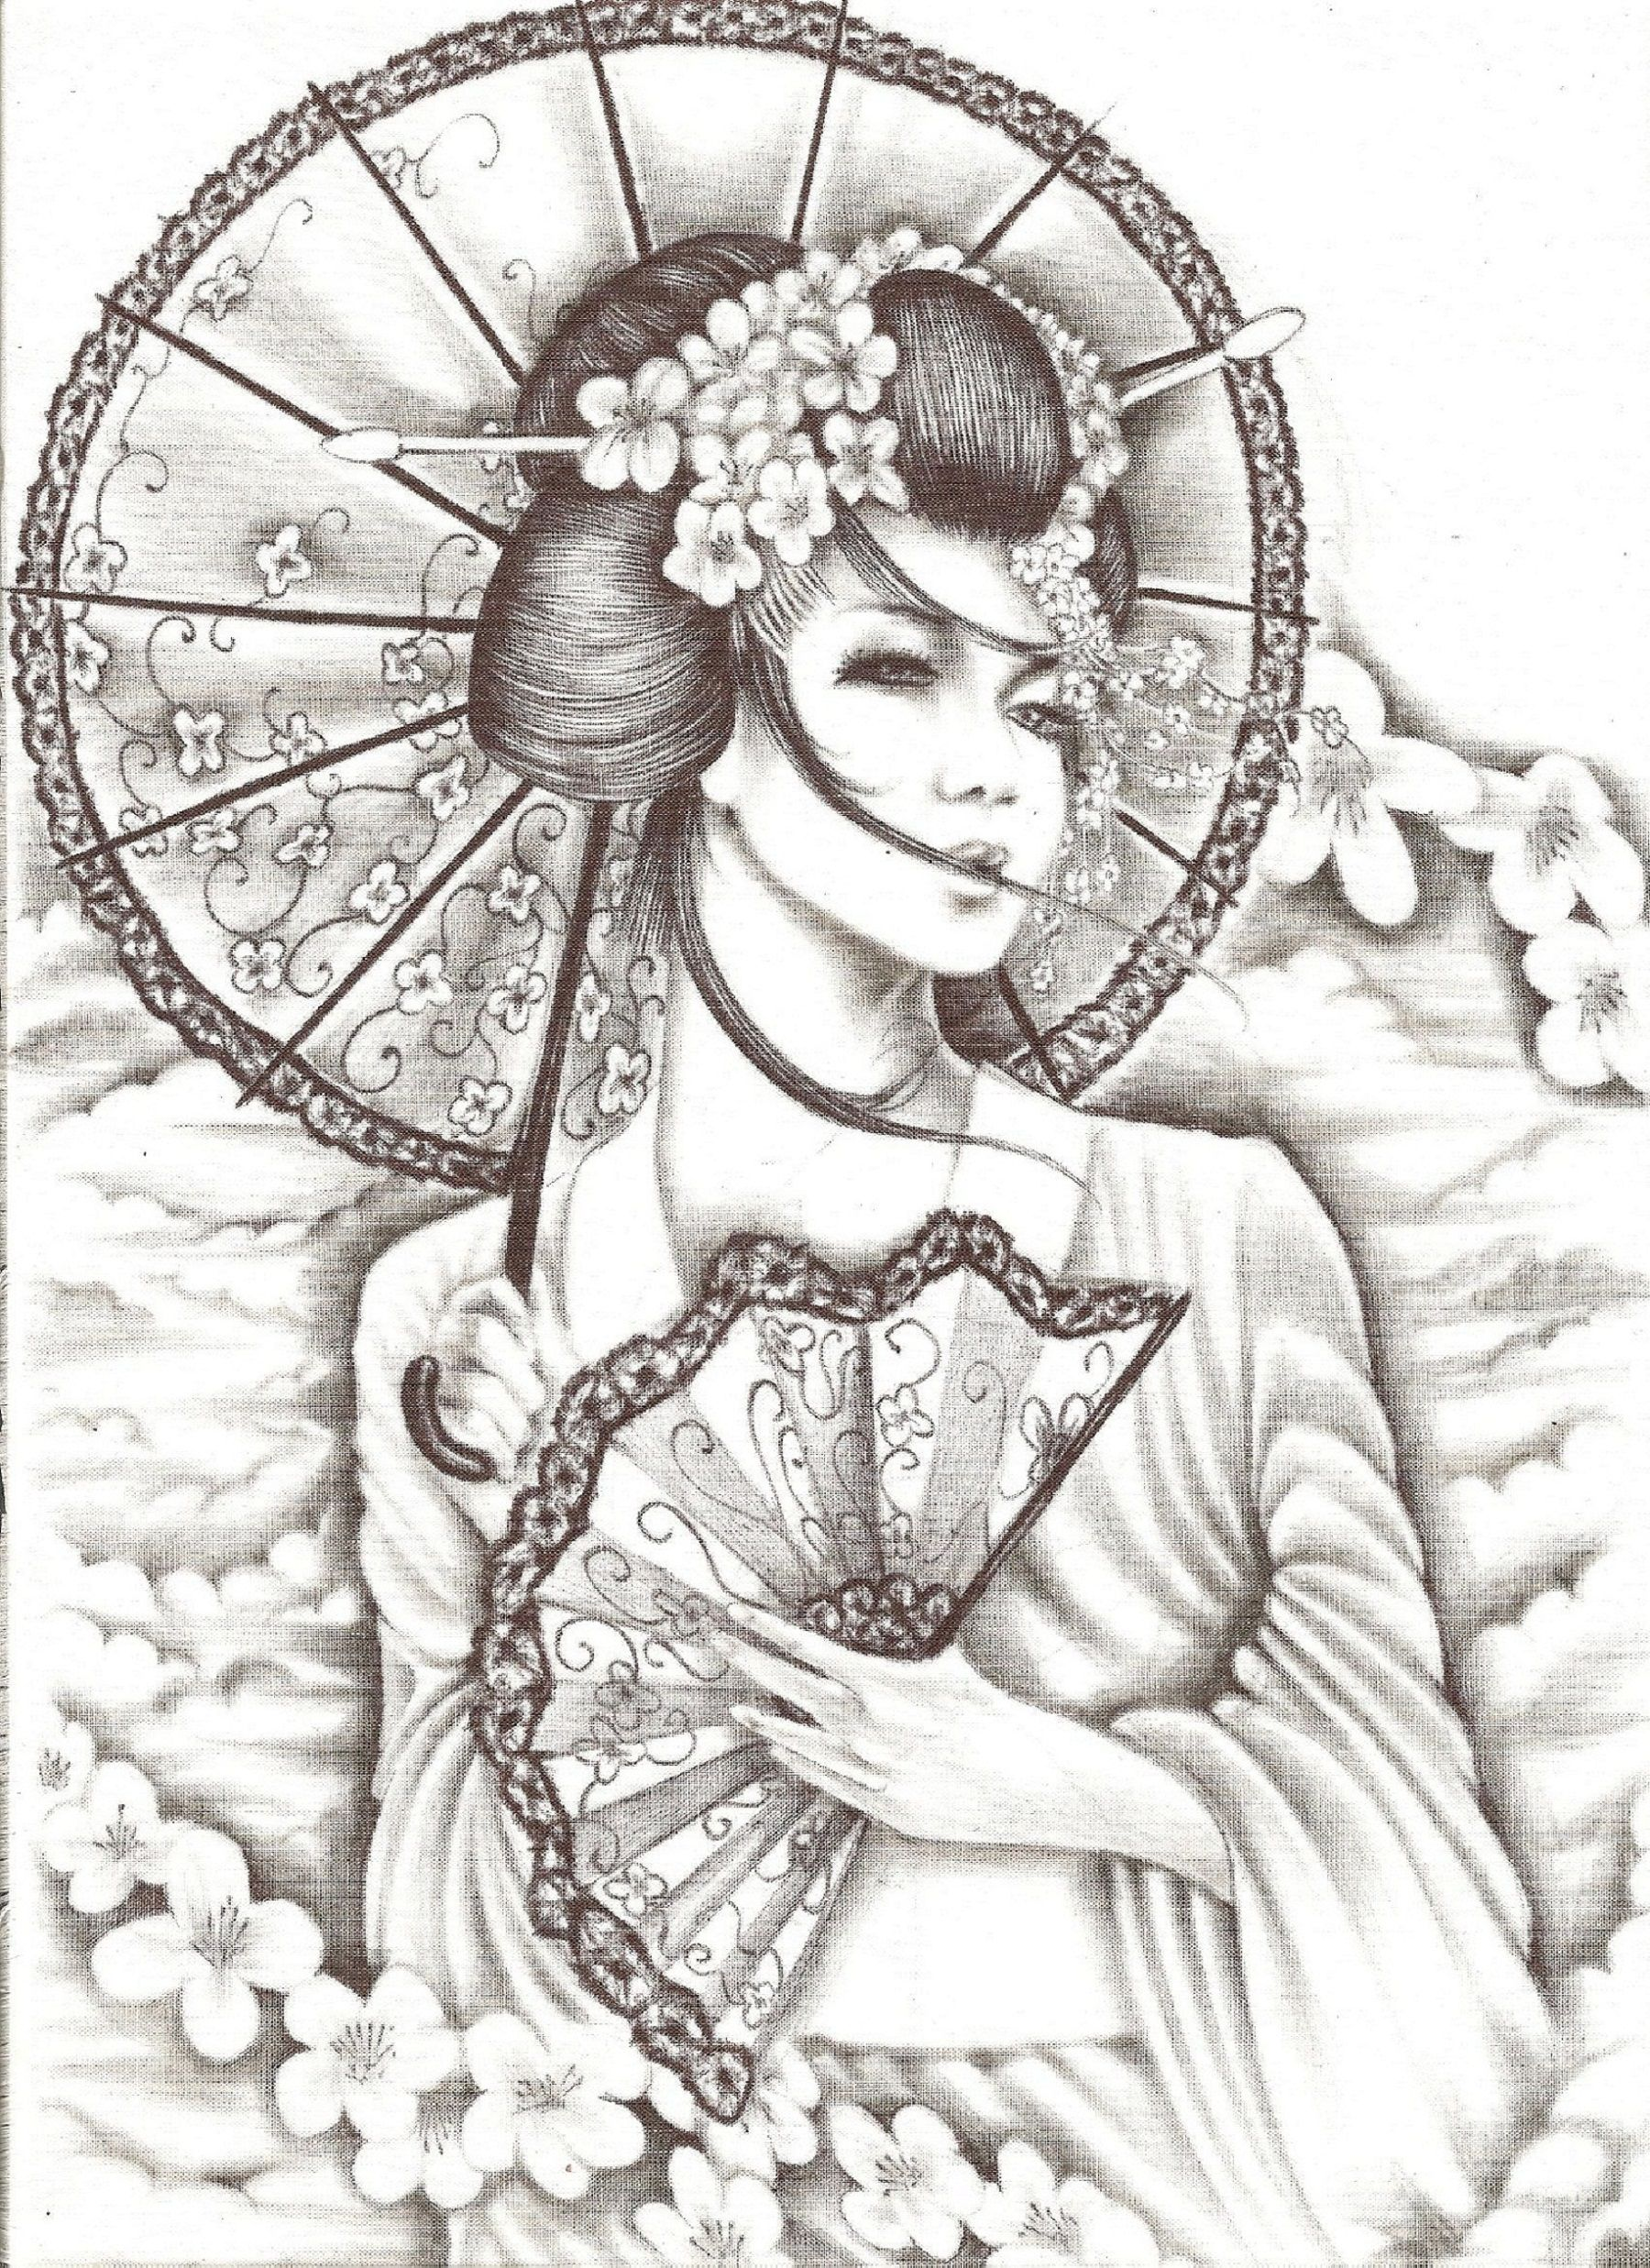 Evil Geisha Tattoo Pin Geisha Japanese Warriors Tattoo Pictures - Best traditional samurai tattoo designs meaning men women